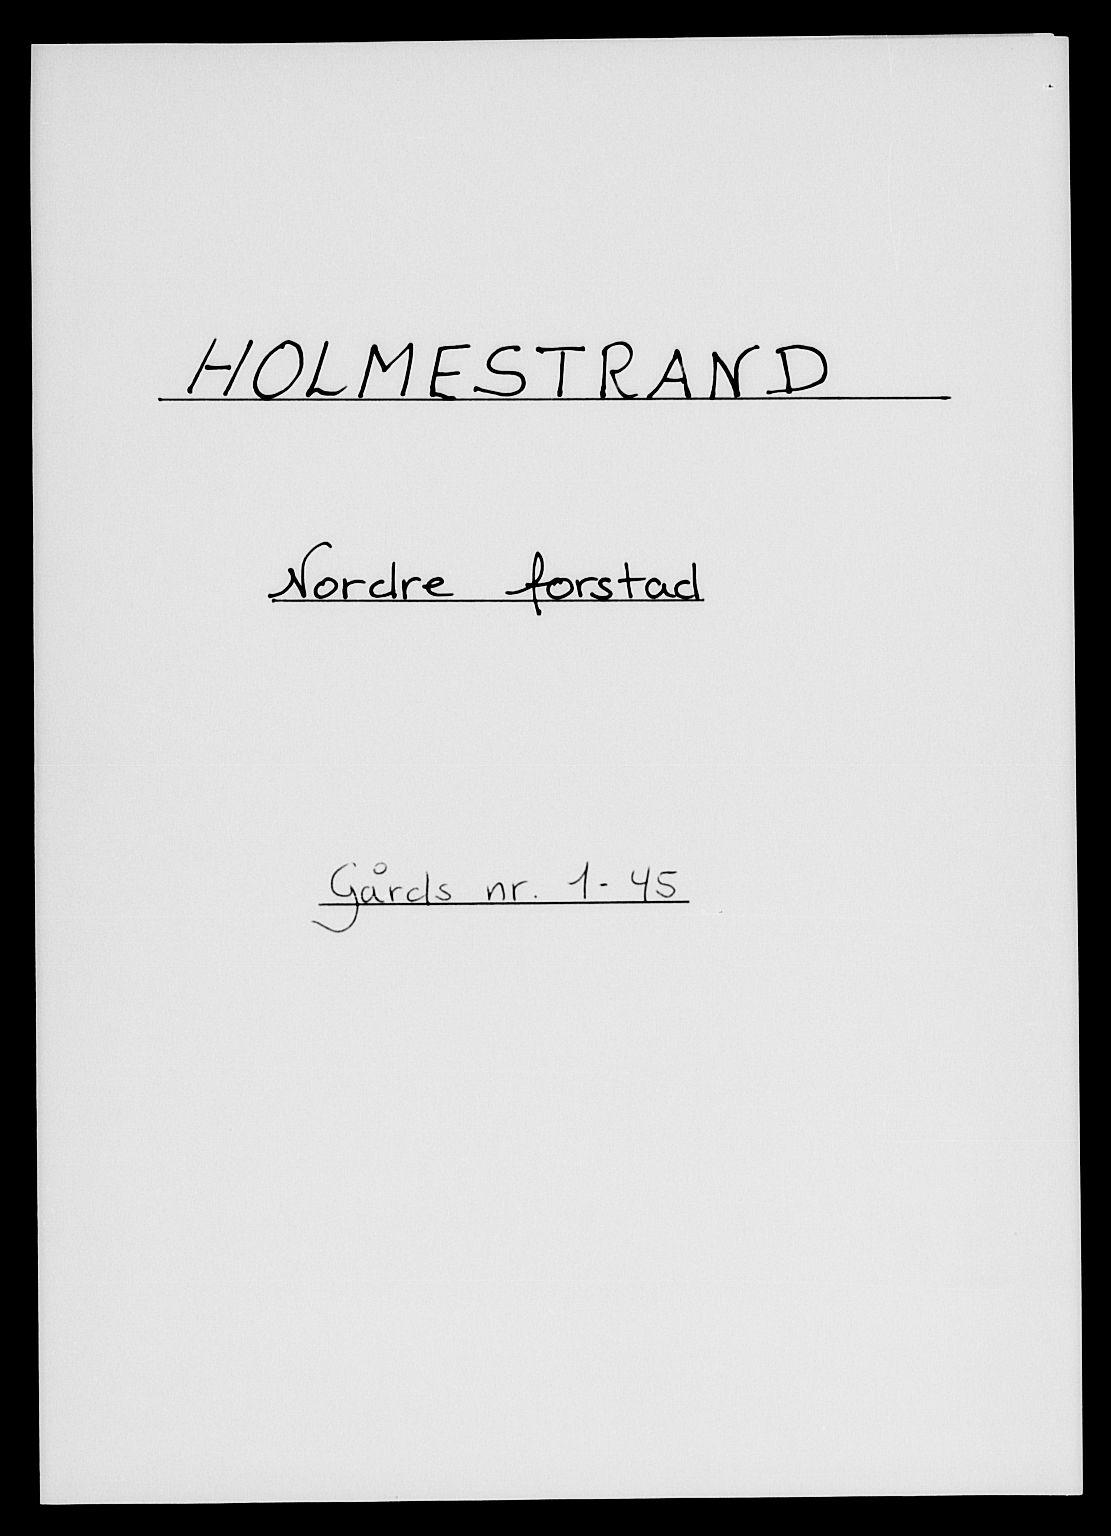 SAKO, 1885 census for 0702 Holmestrand, 1885, p. 1